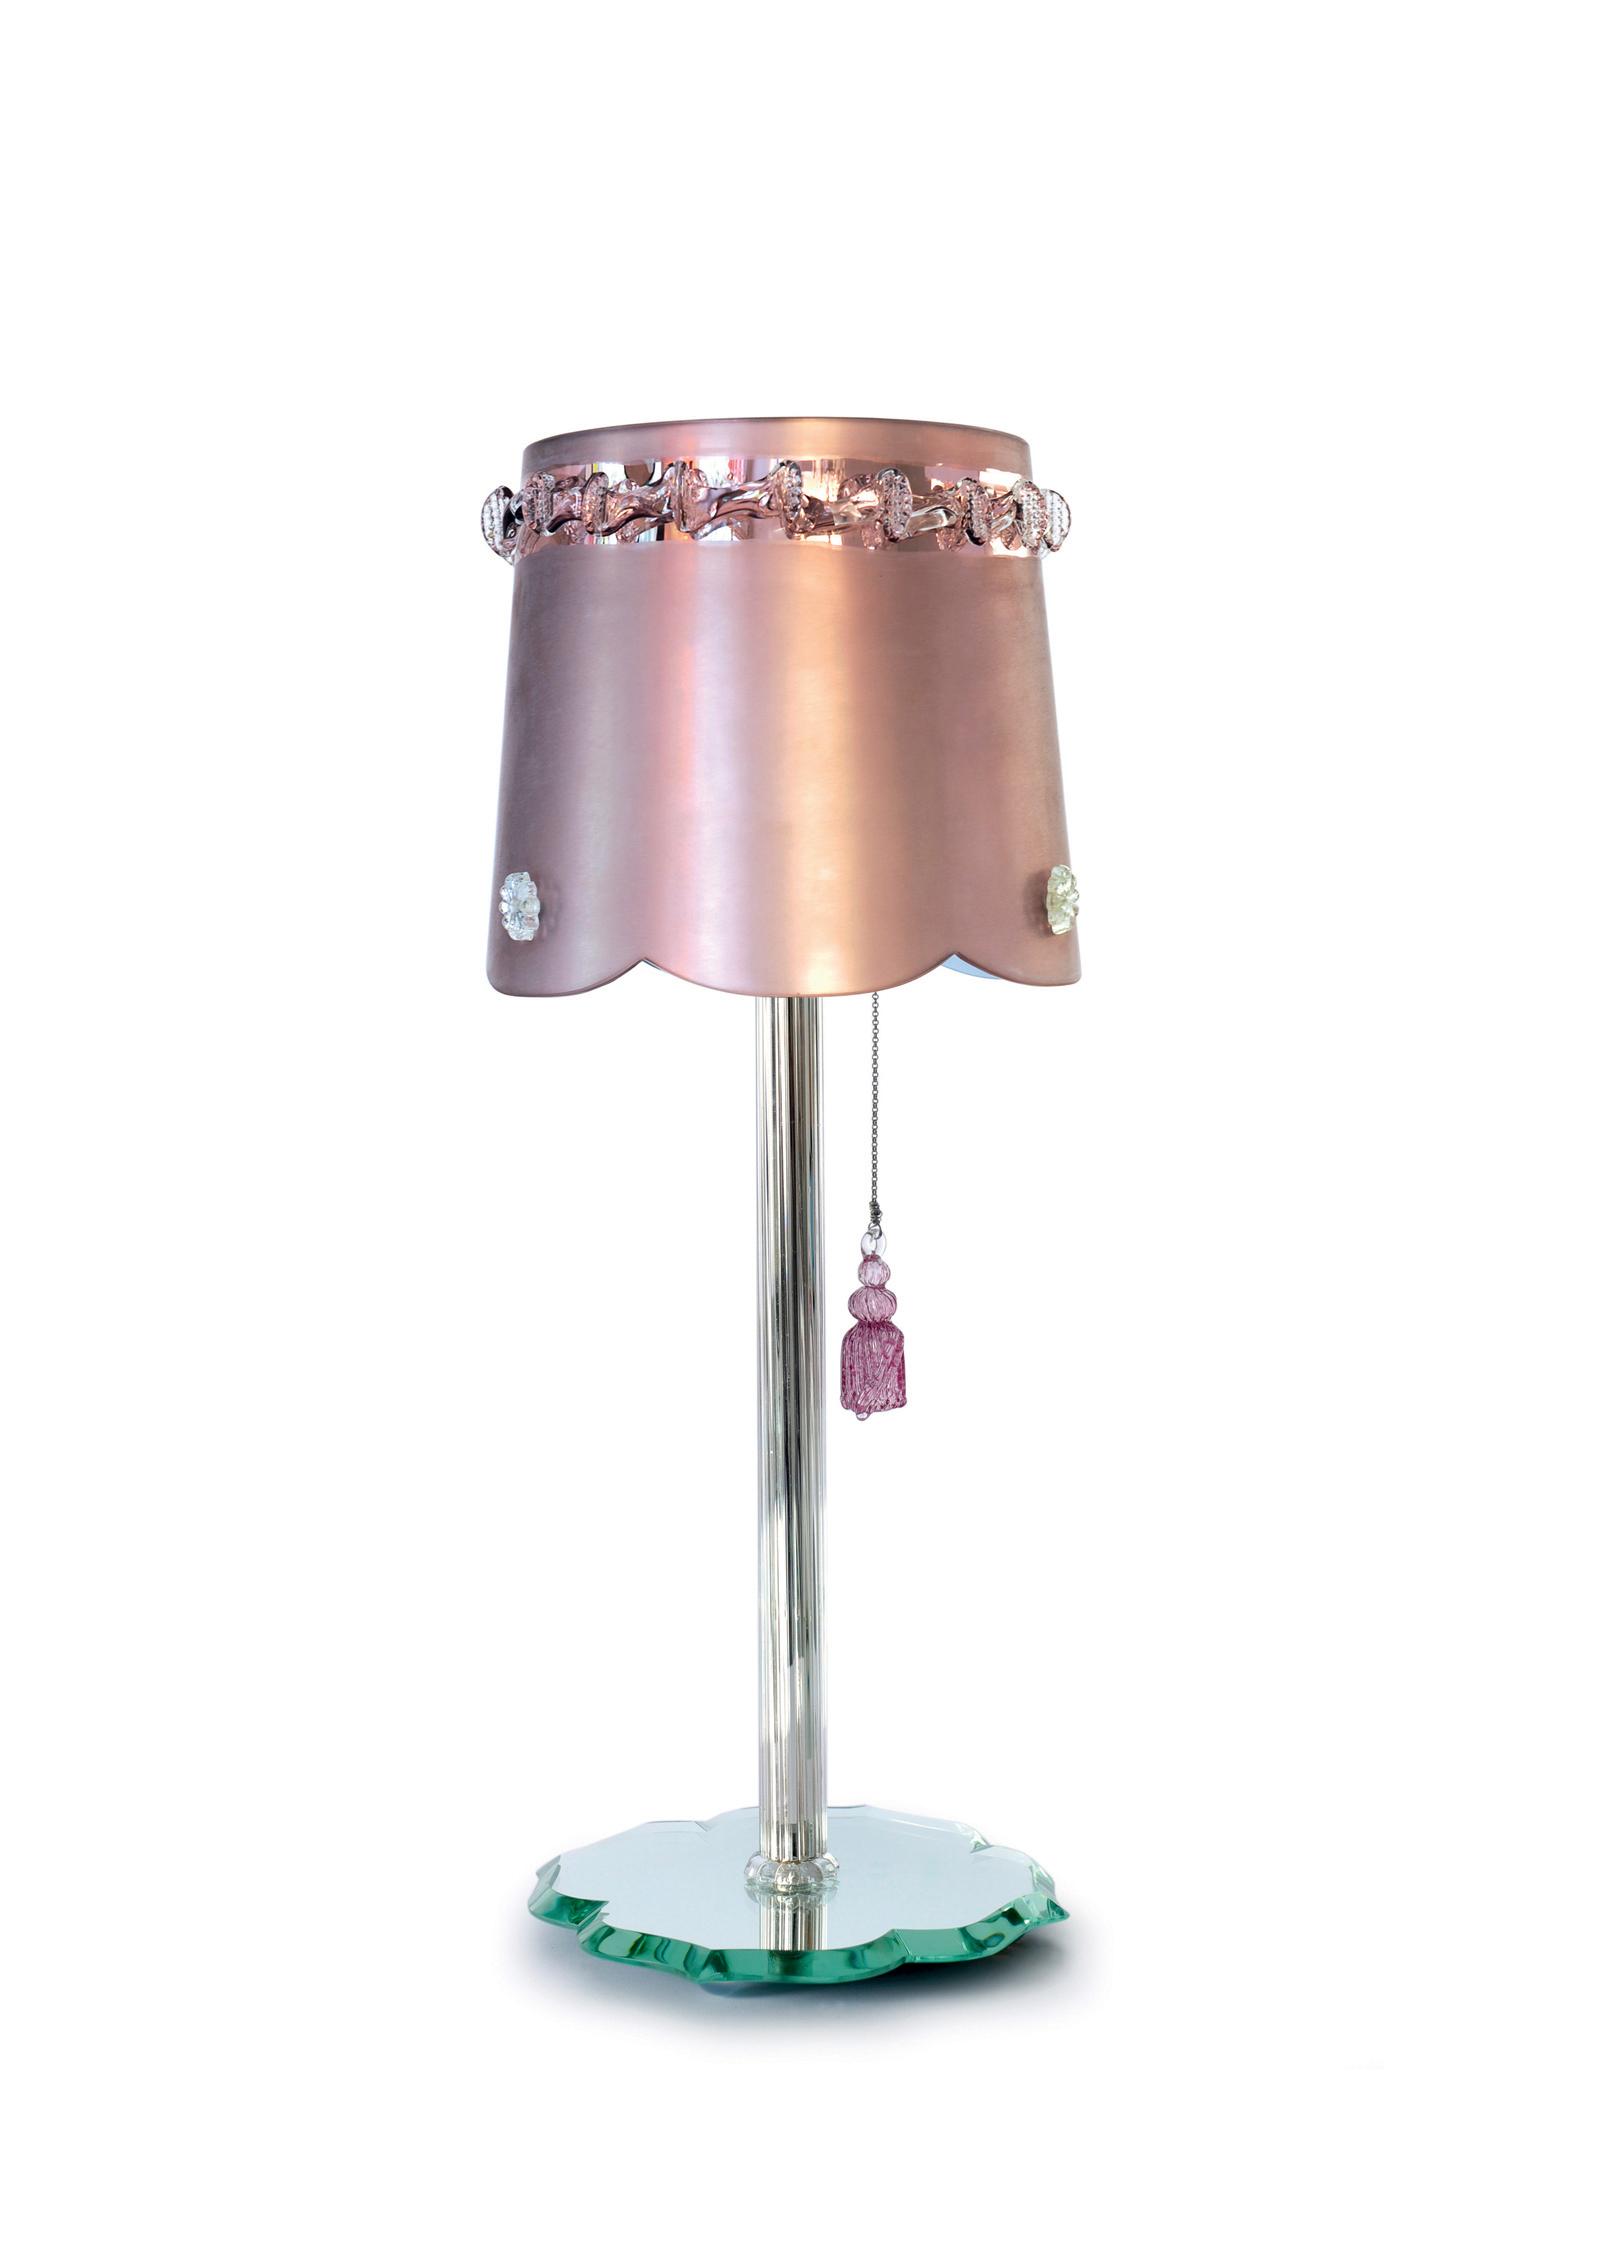 pompon-miroir-rose-pink-mirror-chantal-thomass-veronese.jpg